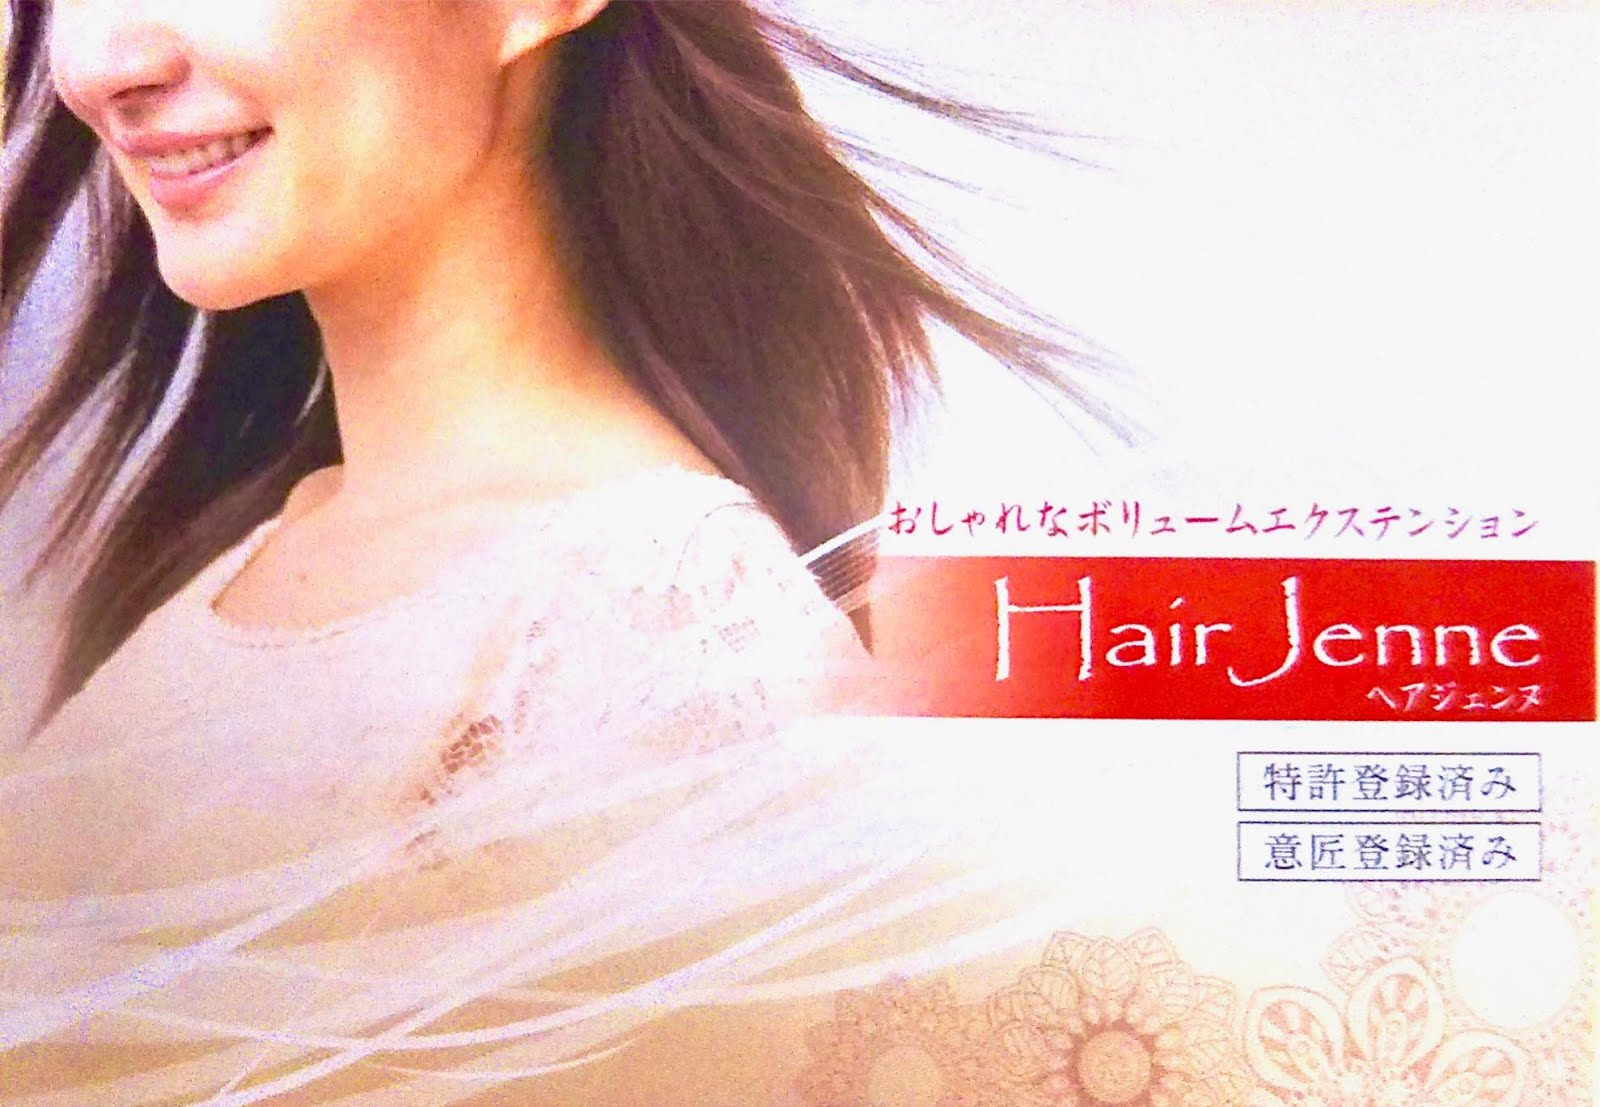 Hair Jenne, ボリューム増毛エクステ